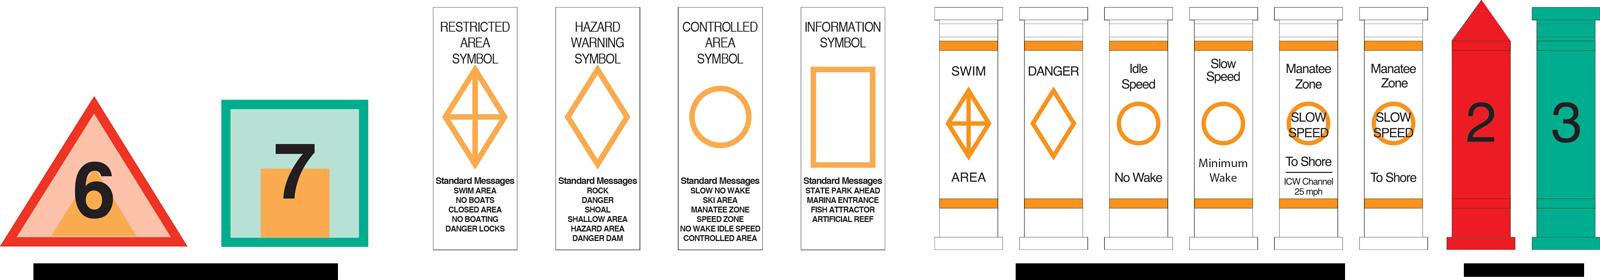 WCIND navigation signs